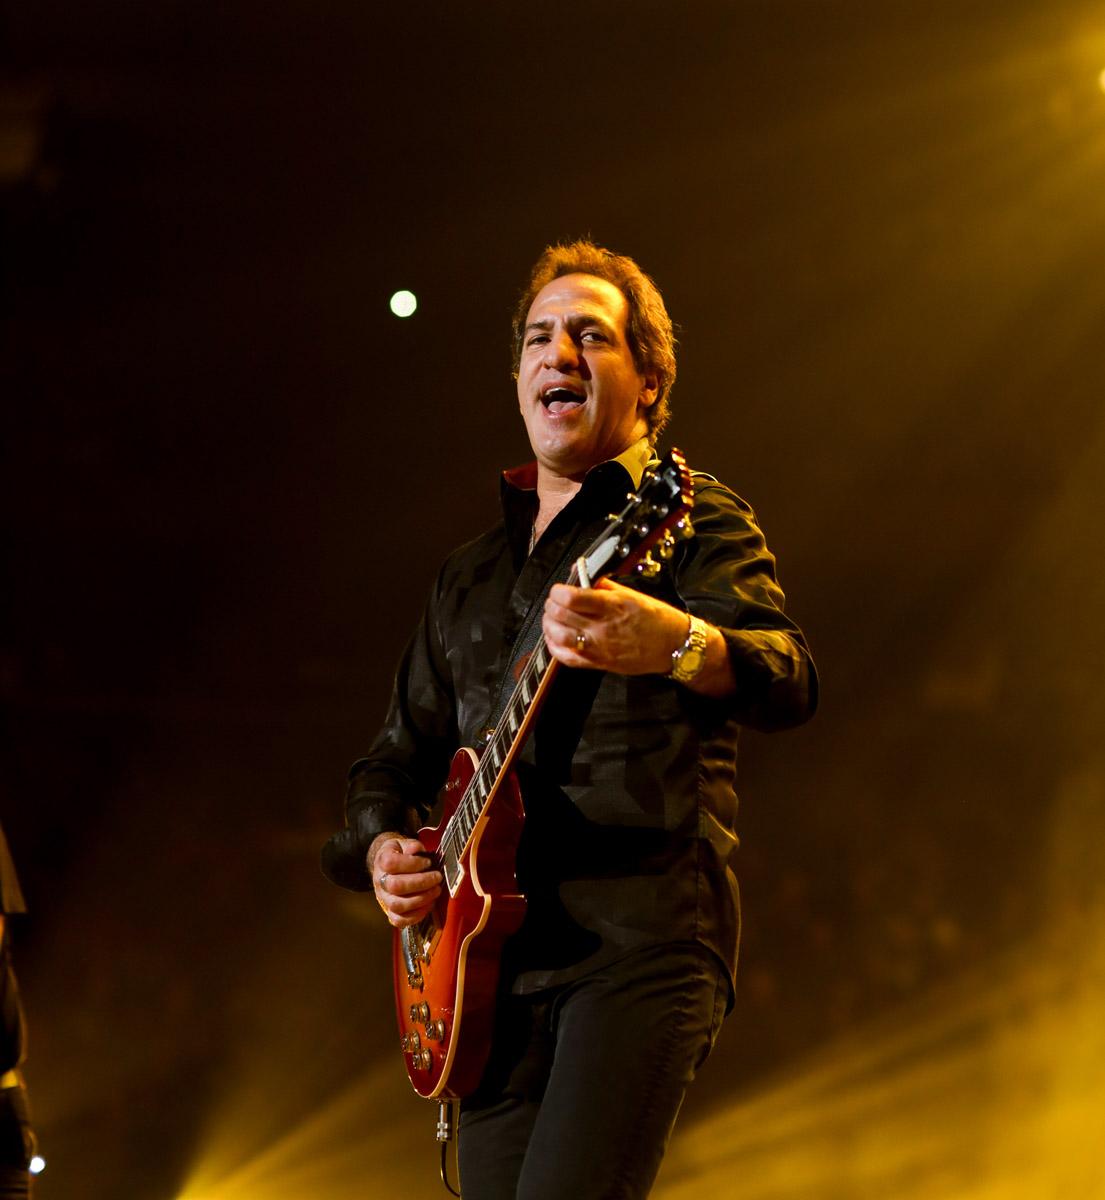 Billy Joel At Madison Square Garden October 27 2018 Billy Joel Official Site